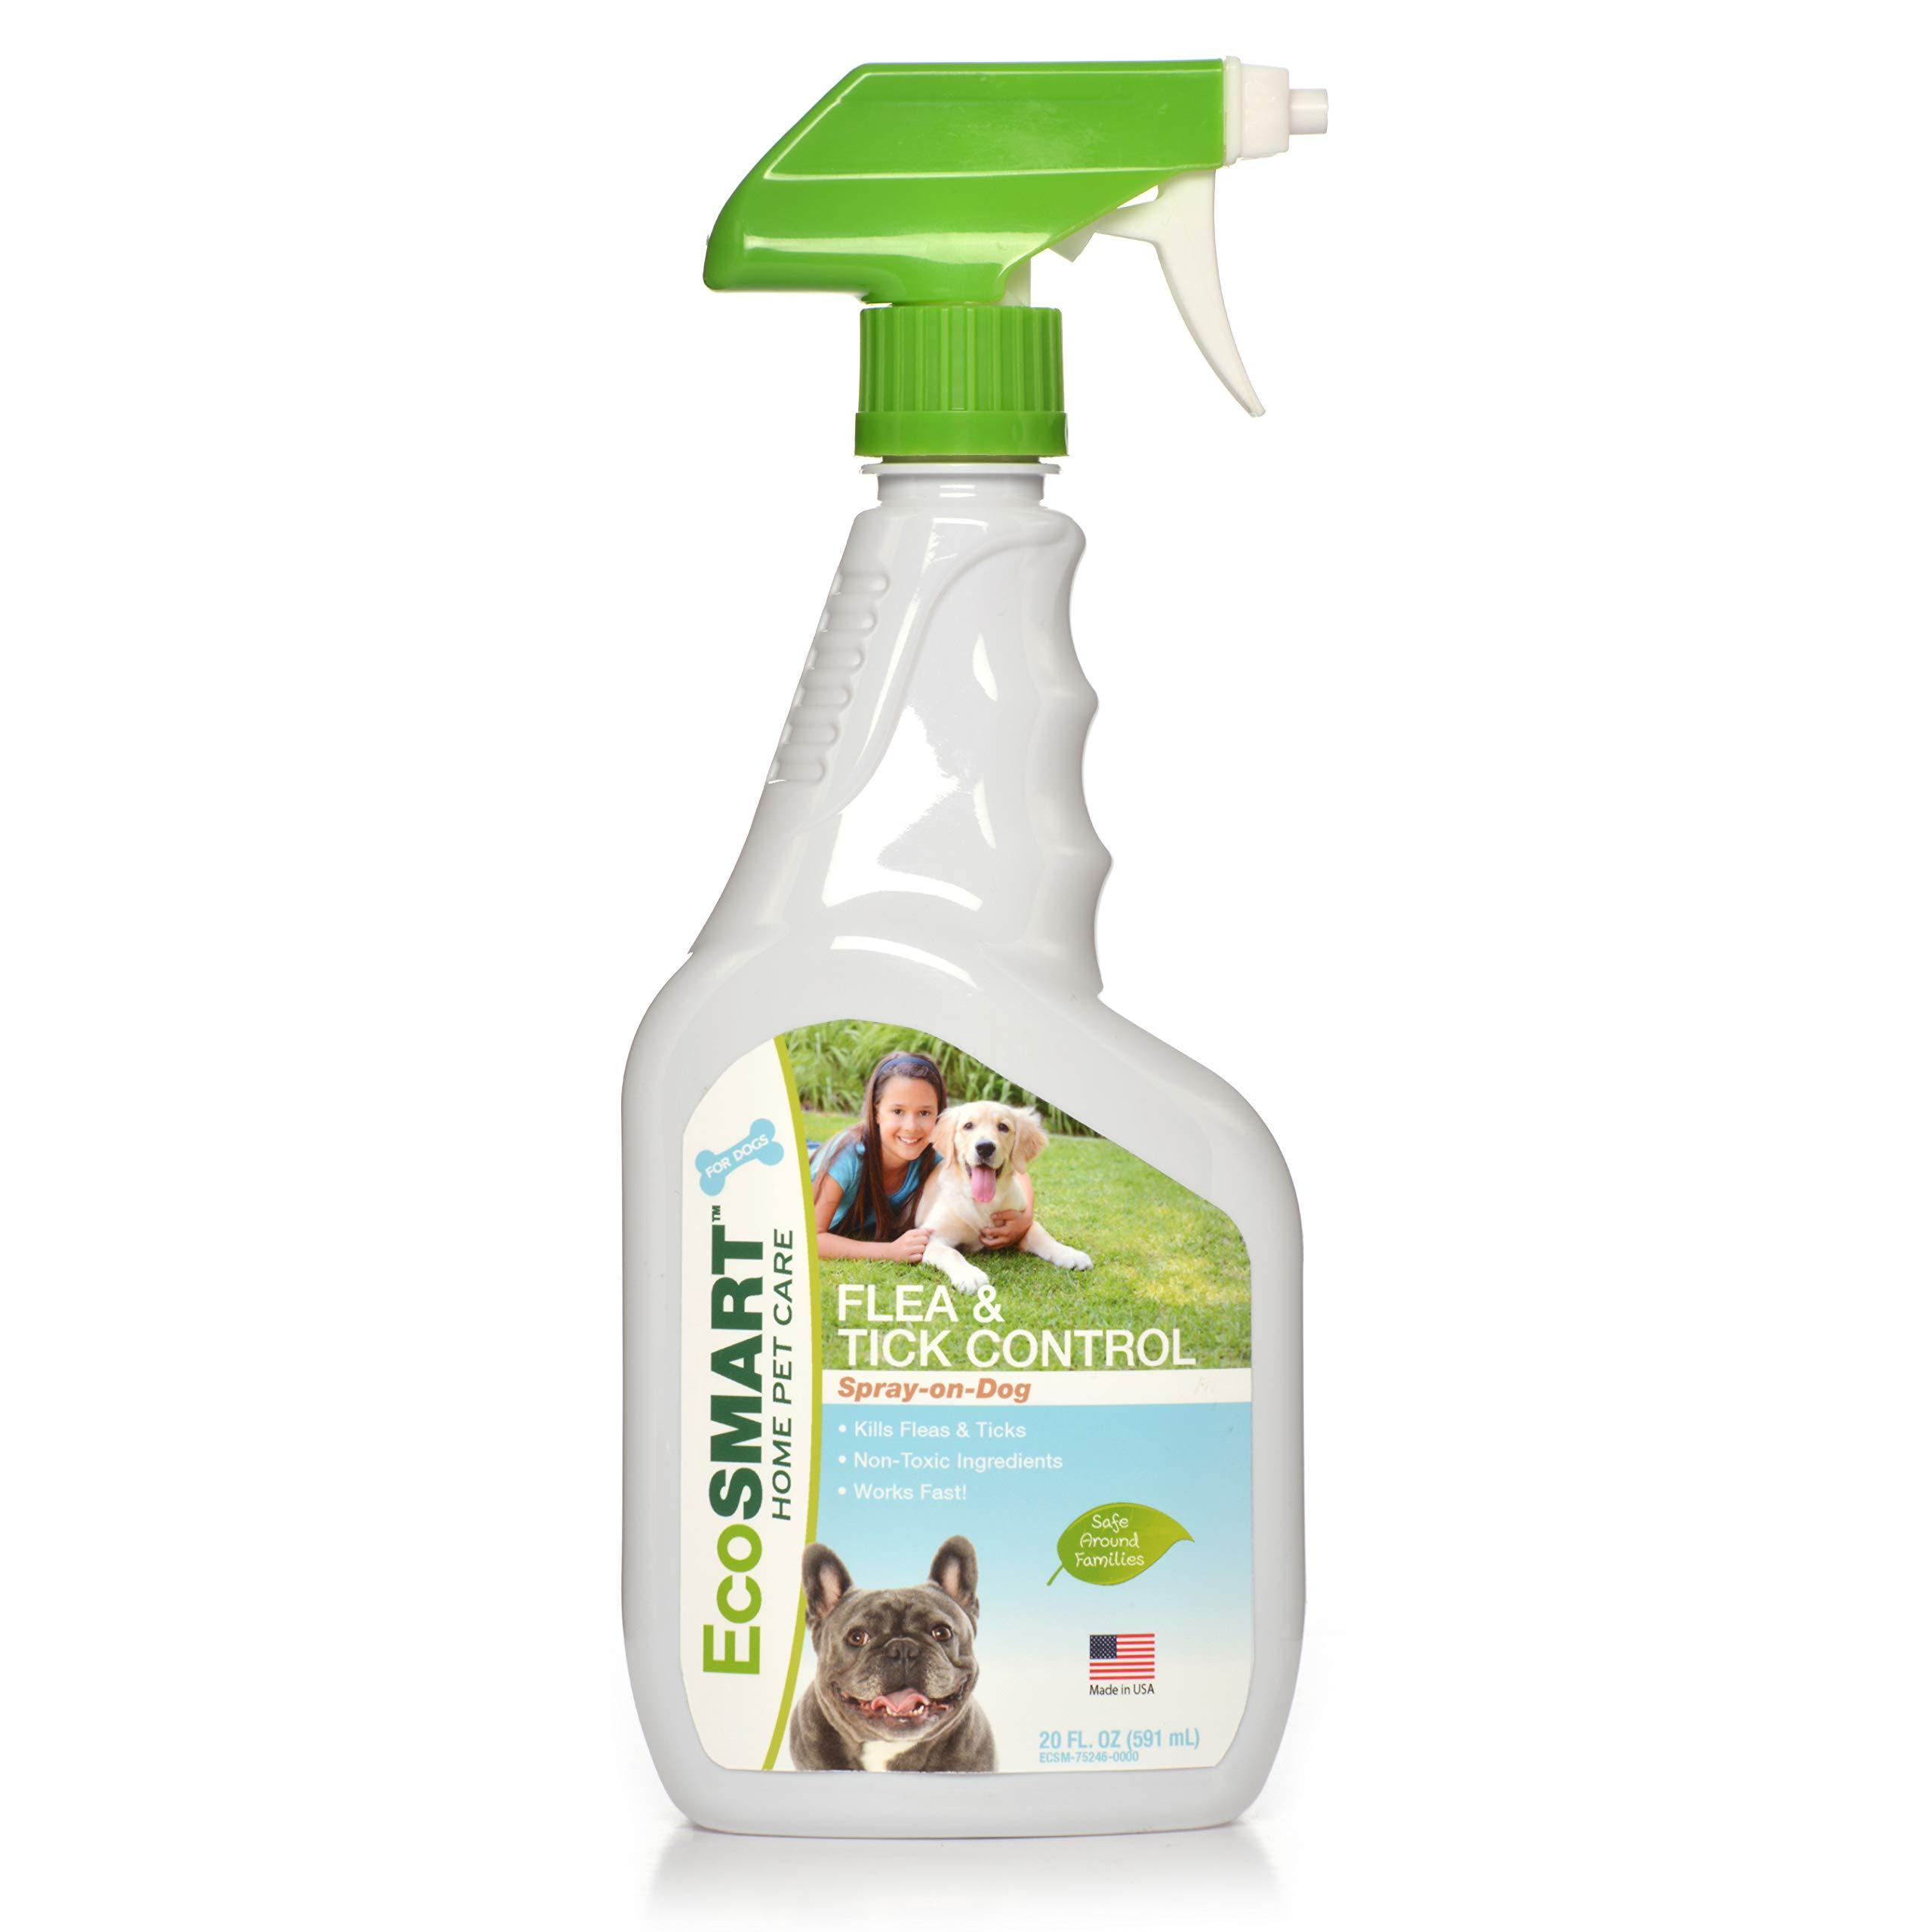 EcoSMART Flea & Tick Killer Spray-on-Dog, 20 oz. Ready-to-Spray Bottle by Ecosmart